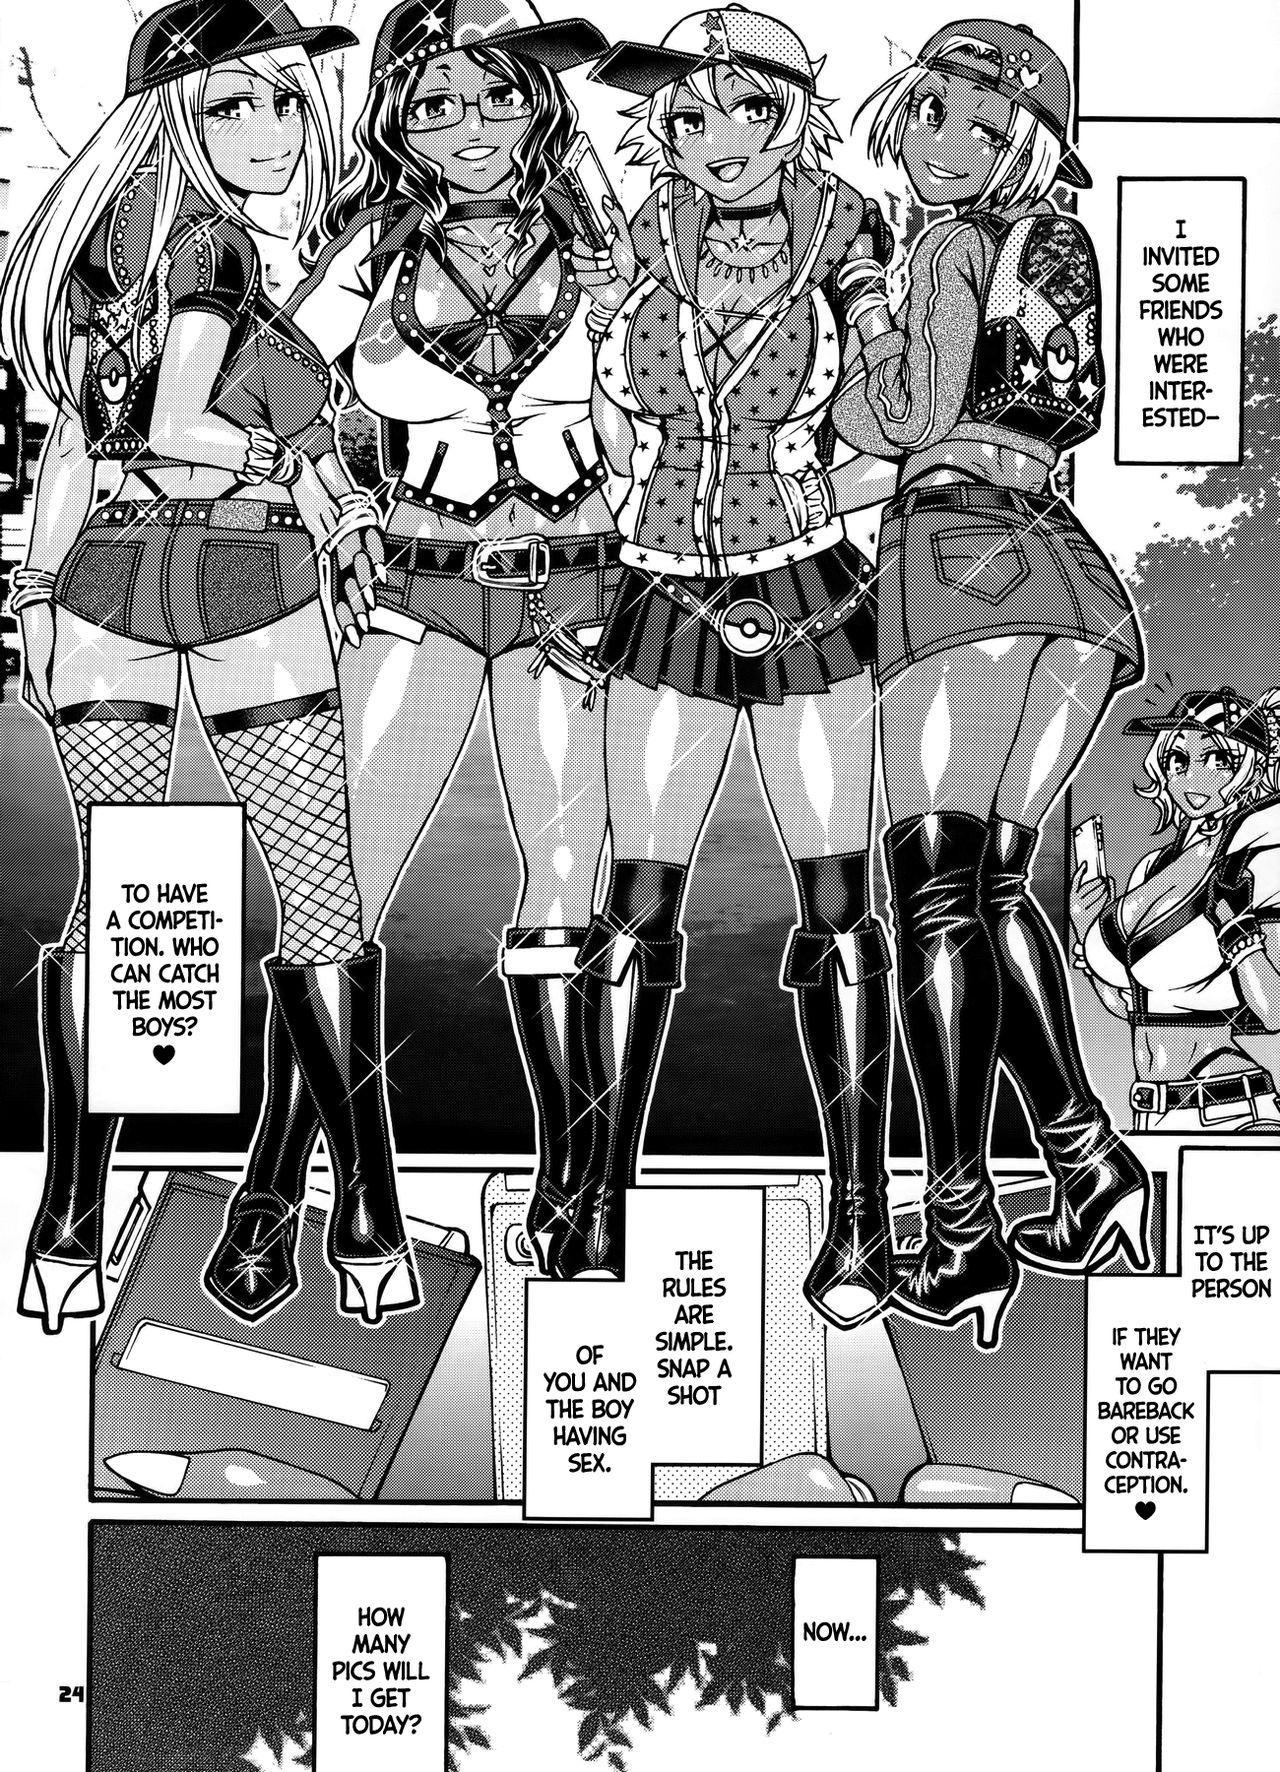 Snack Kankaku de H shiyo | Think Of Sex Like A Snack 22